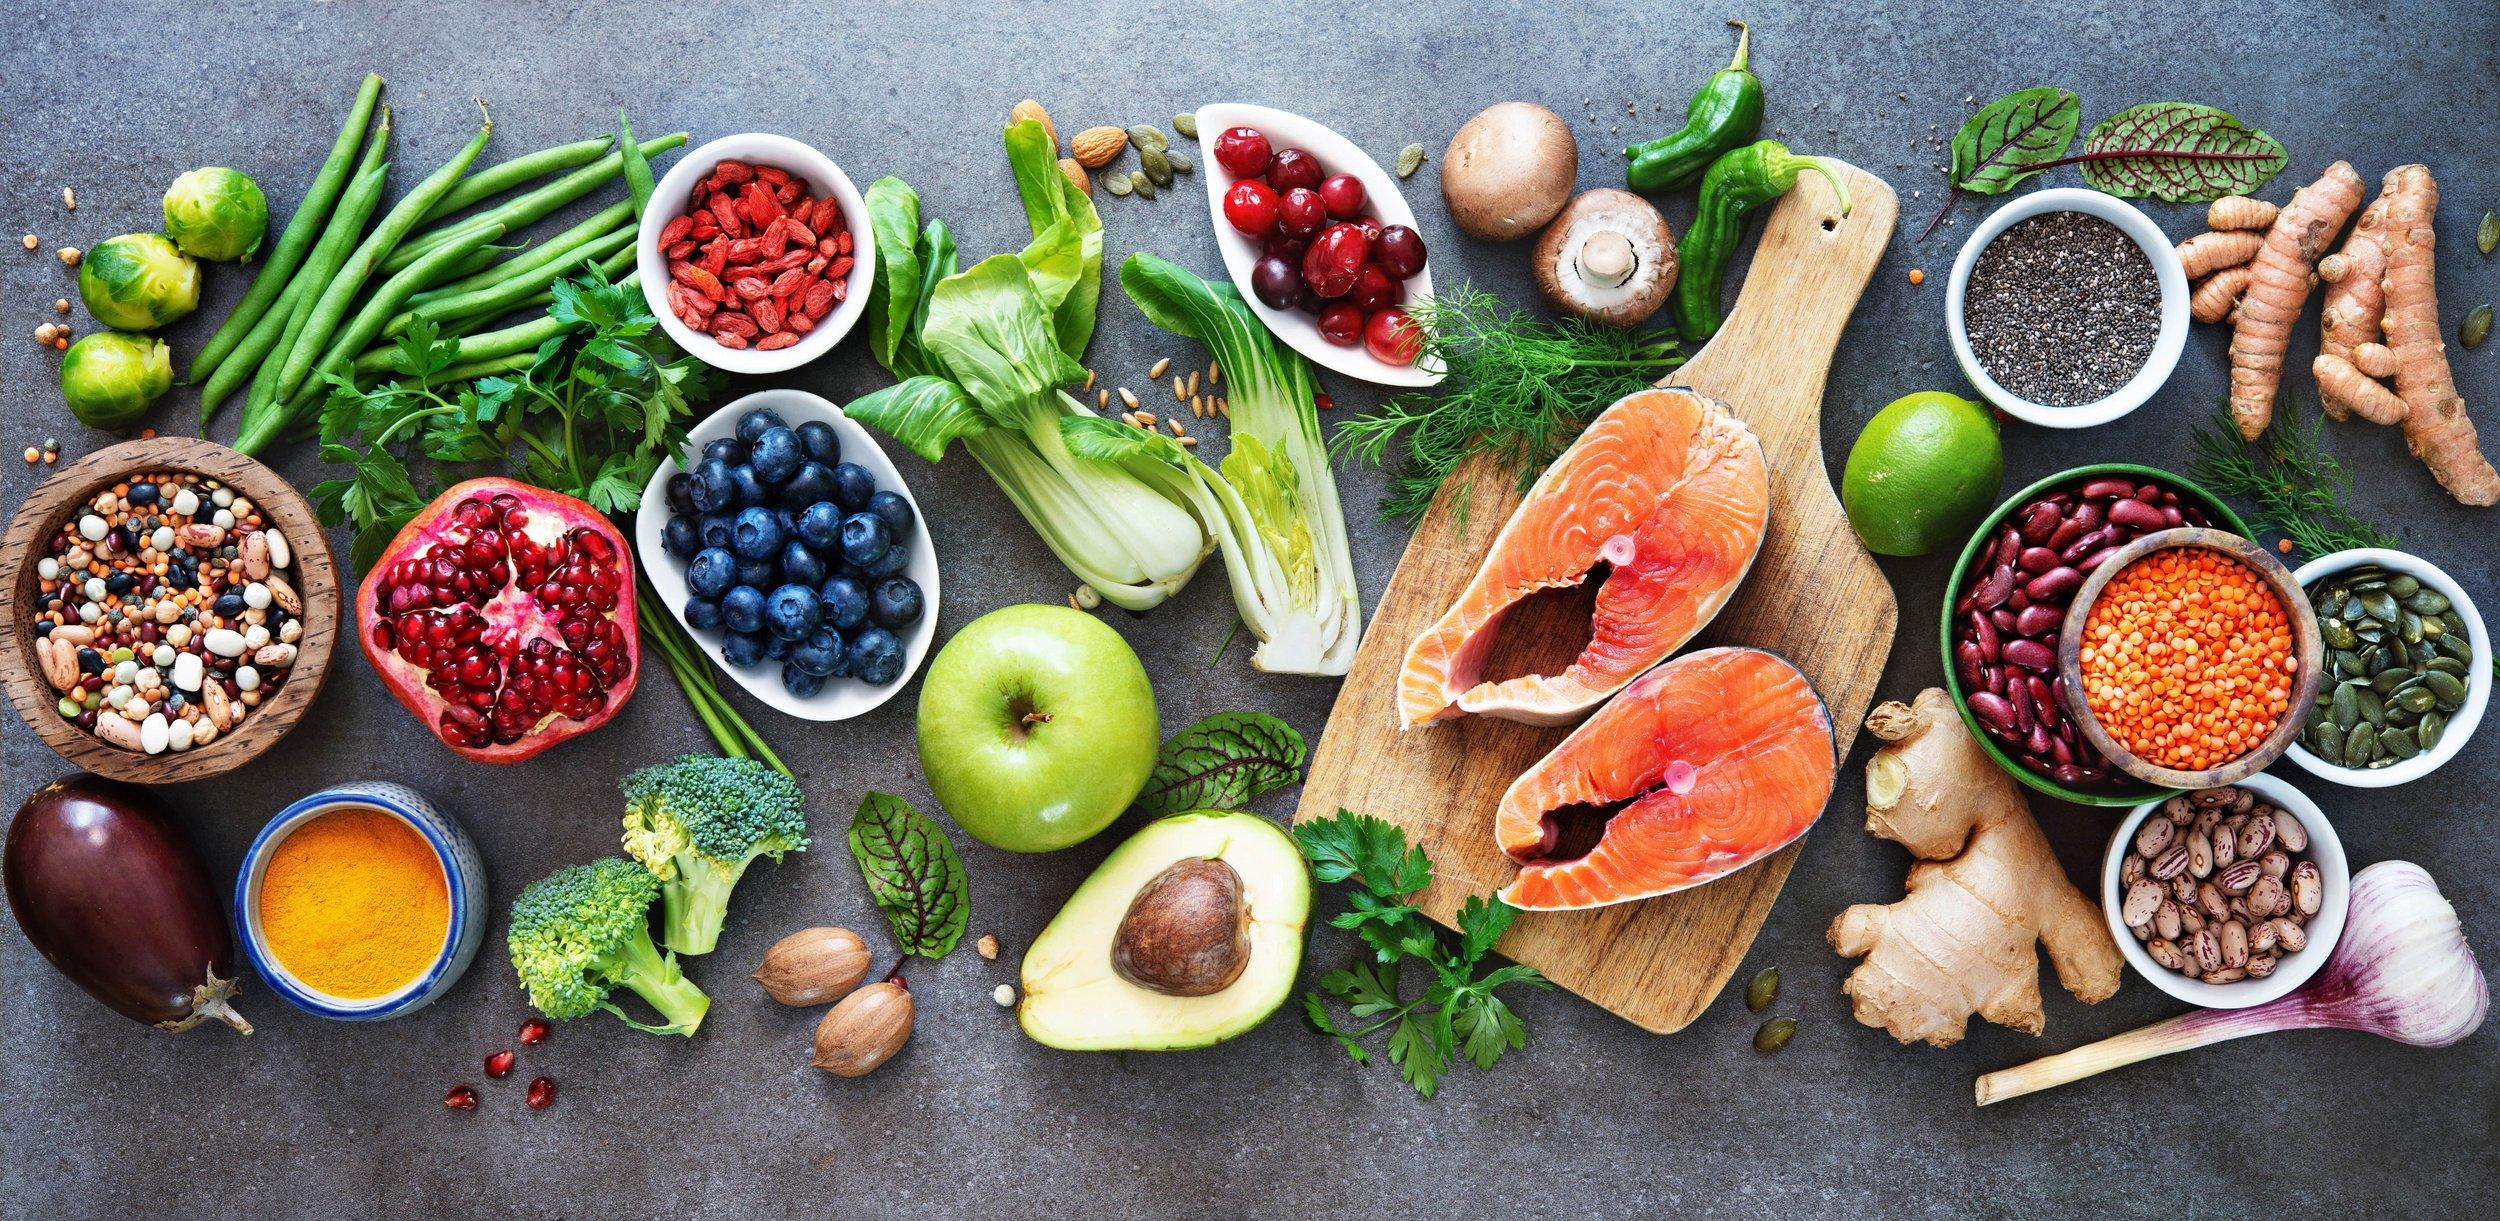 Set of various fresh exotic fruits